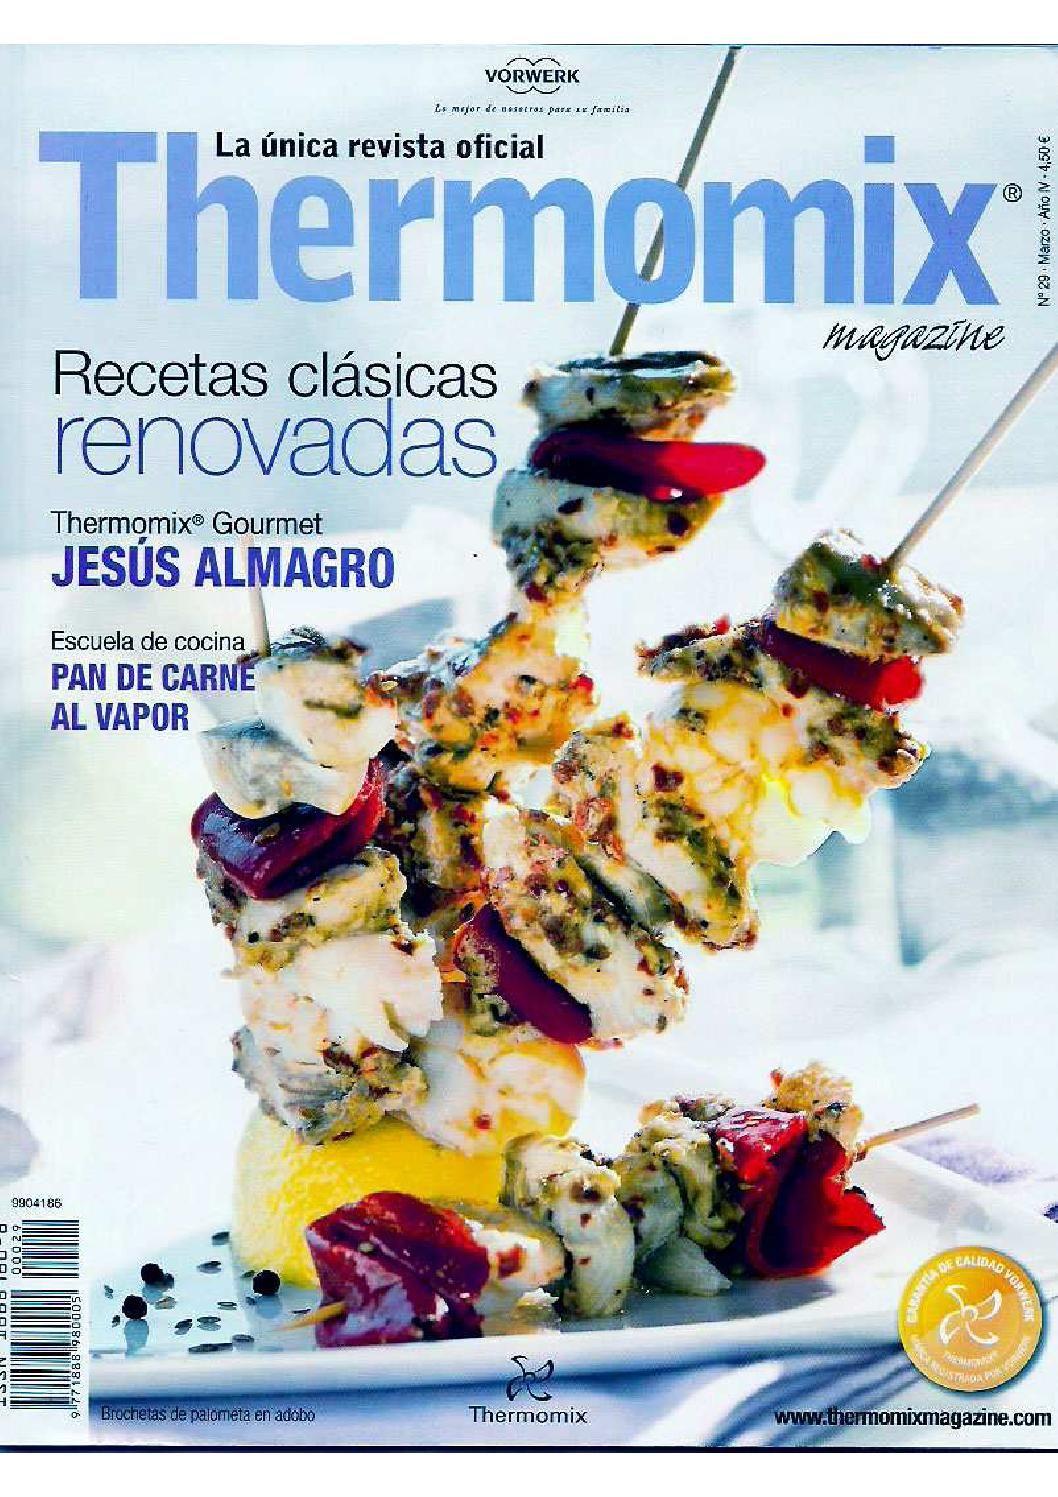 Revista Thermomix Nº29 Recetas Clásicas Renovadas Recetas